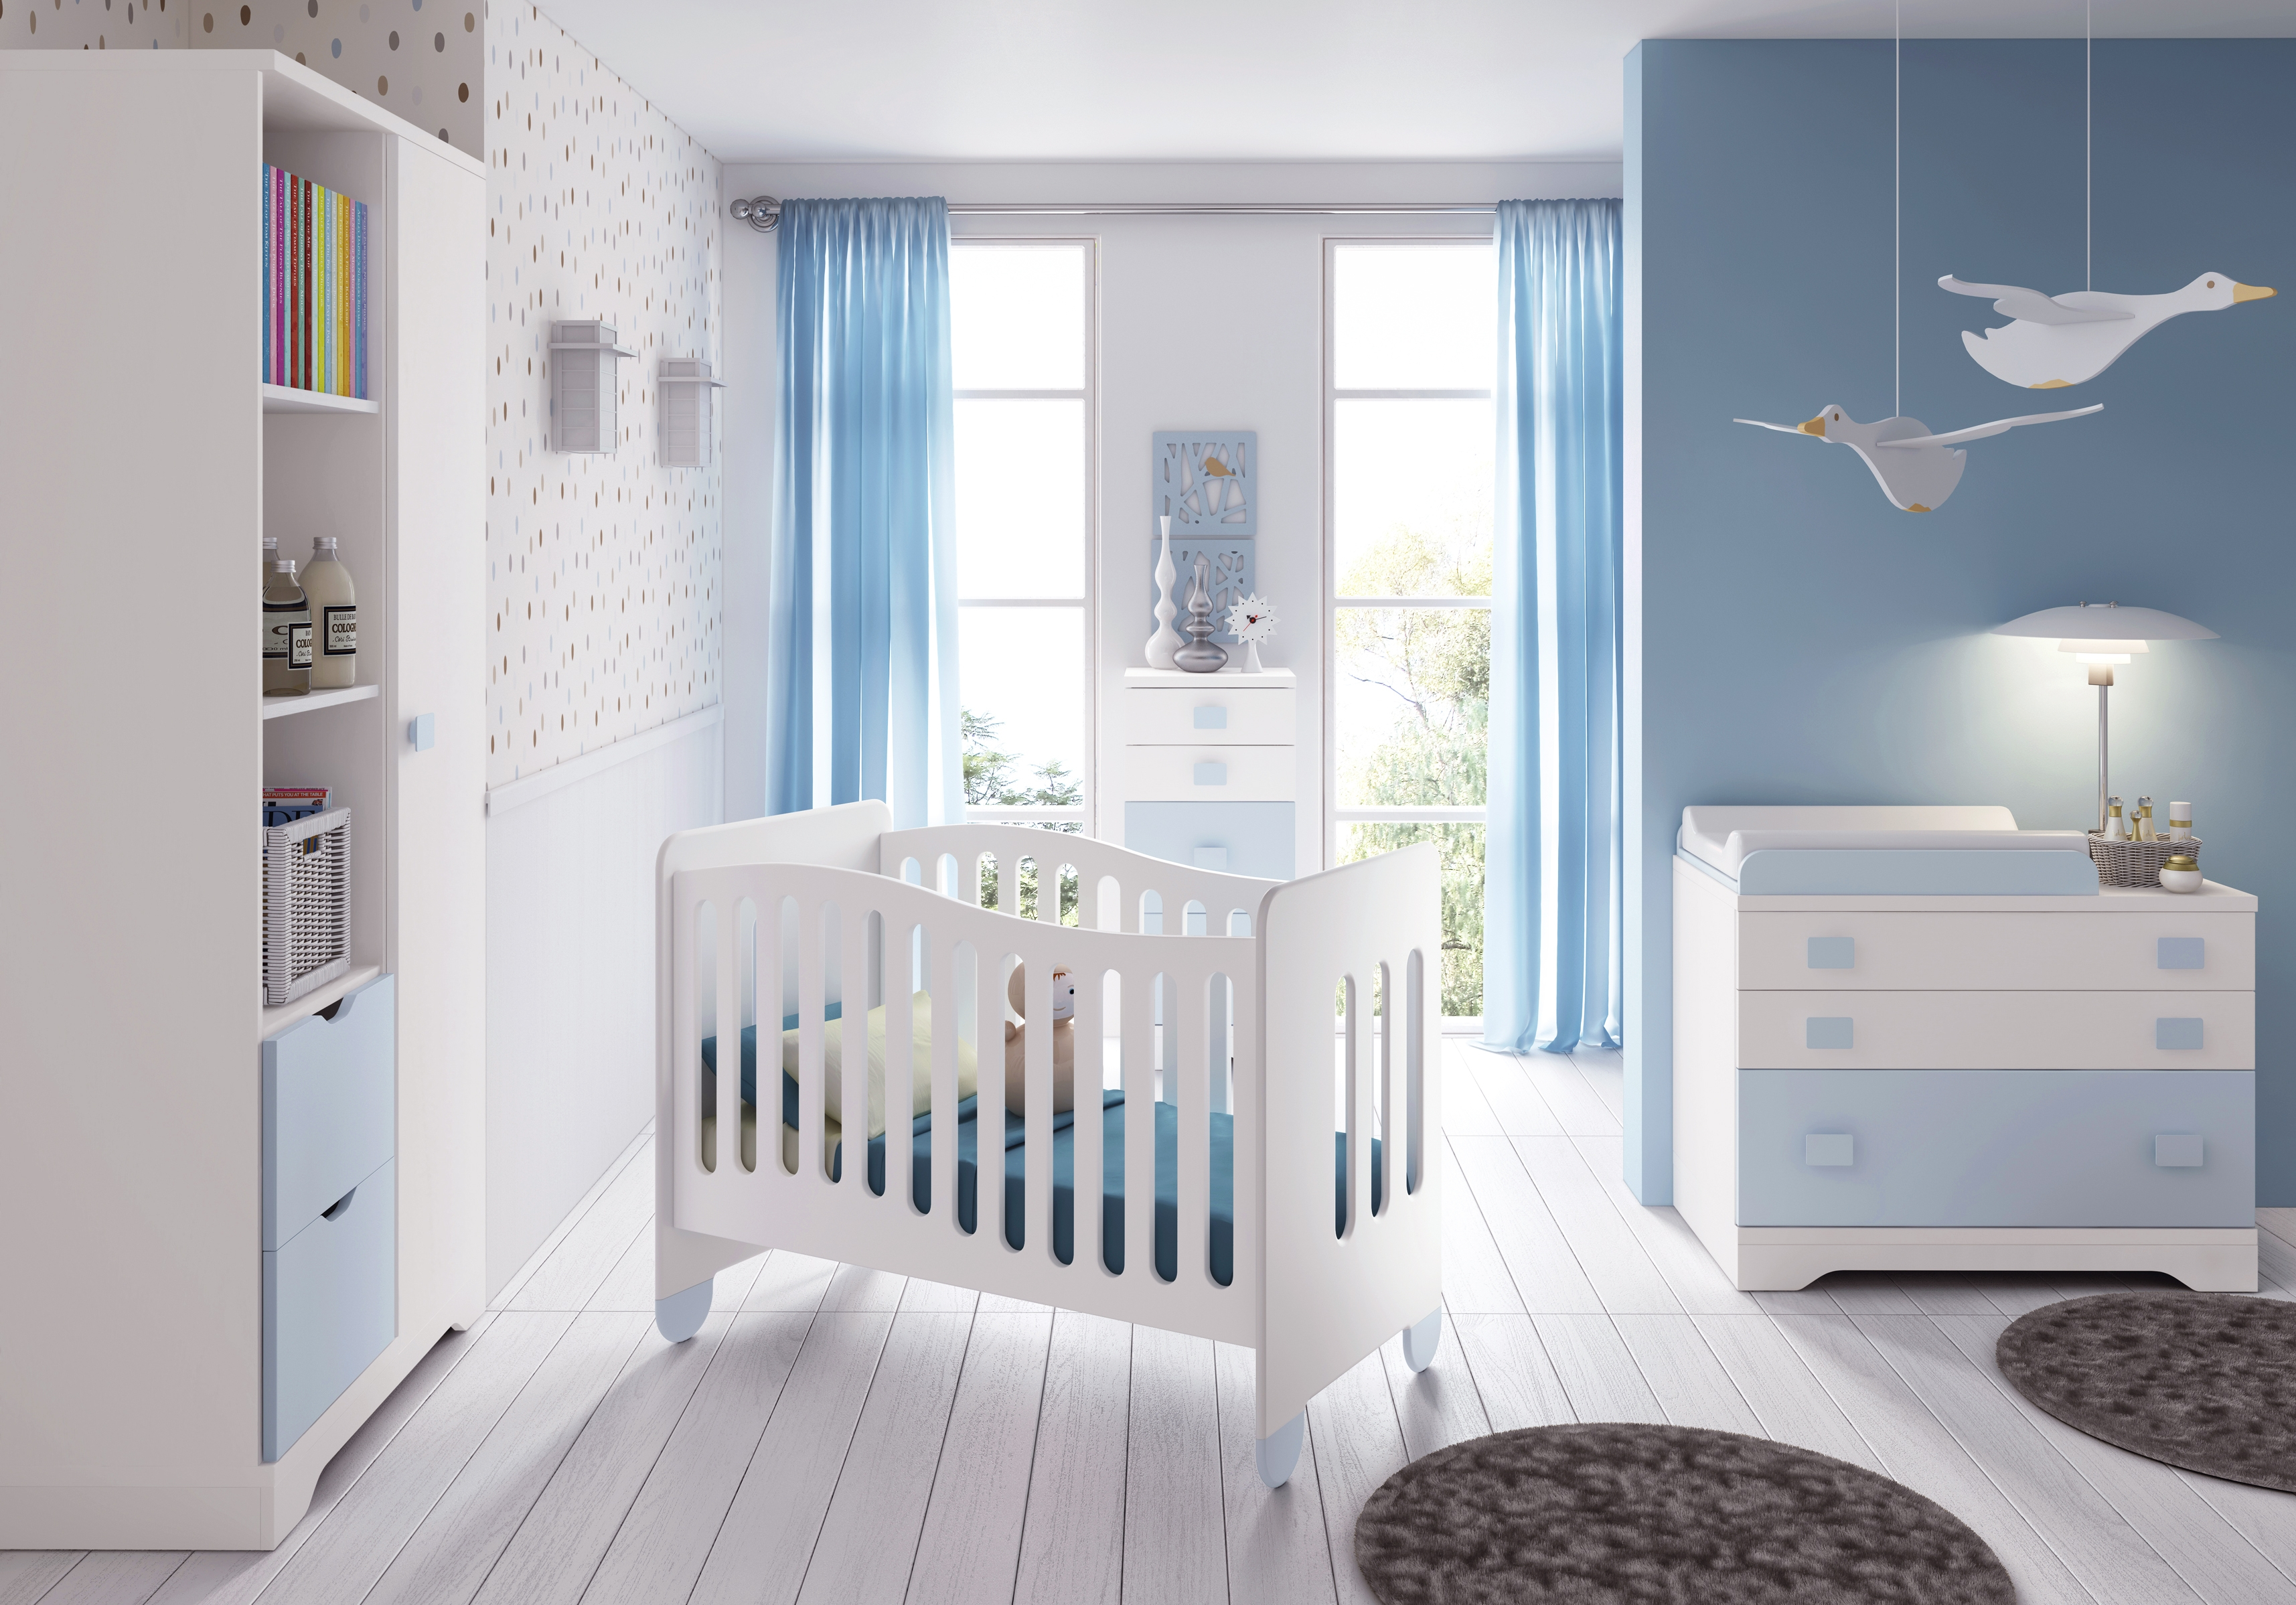 10 chambres de petits gar ons modernes et originales for Chambre garcon marron et bleu